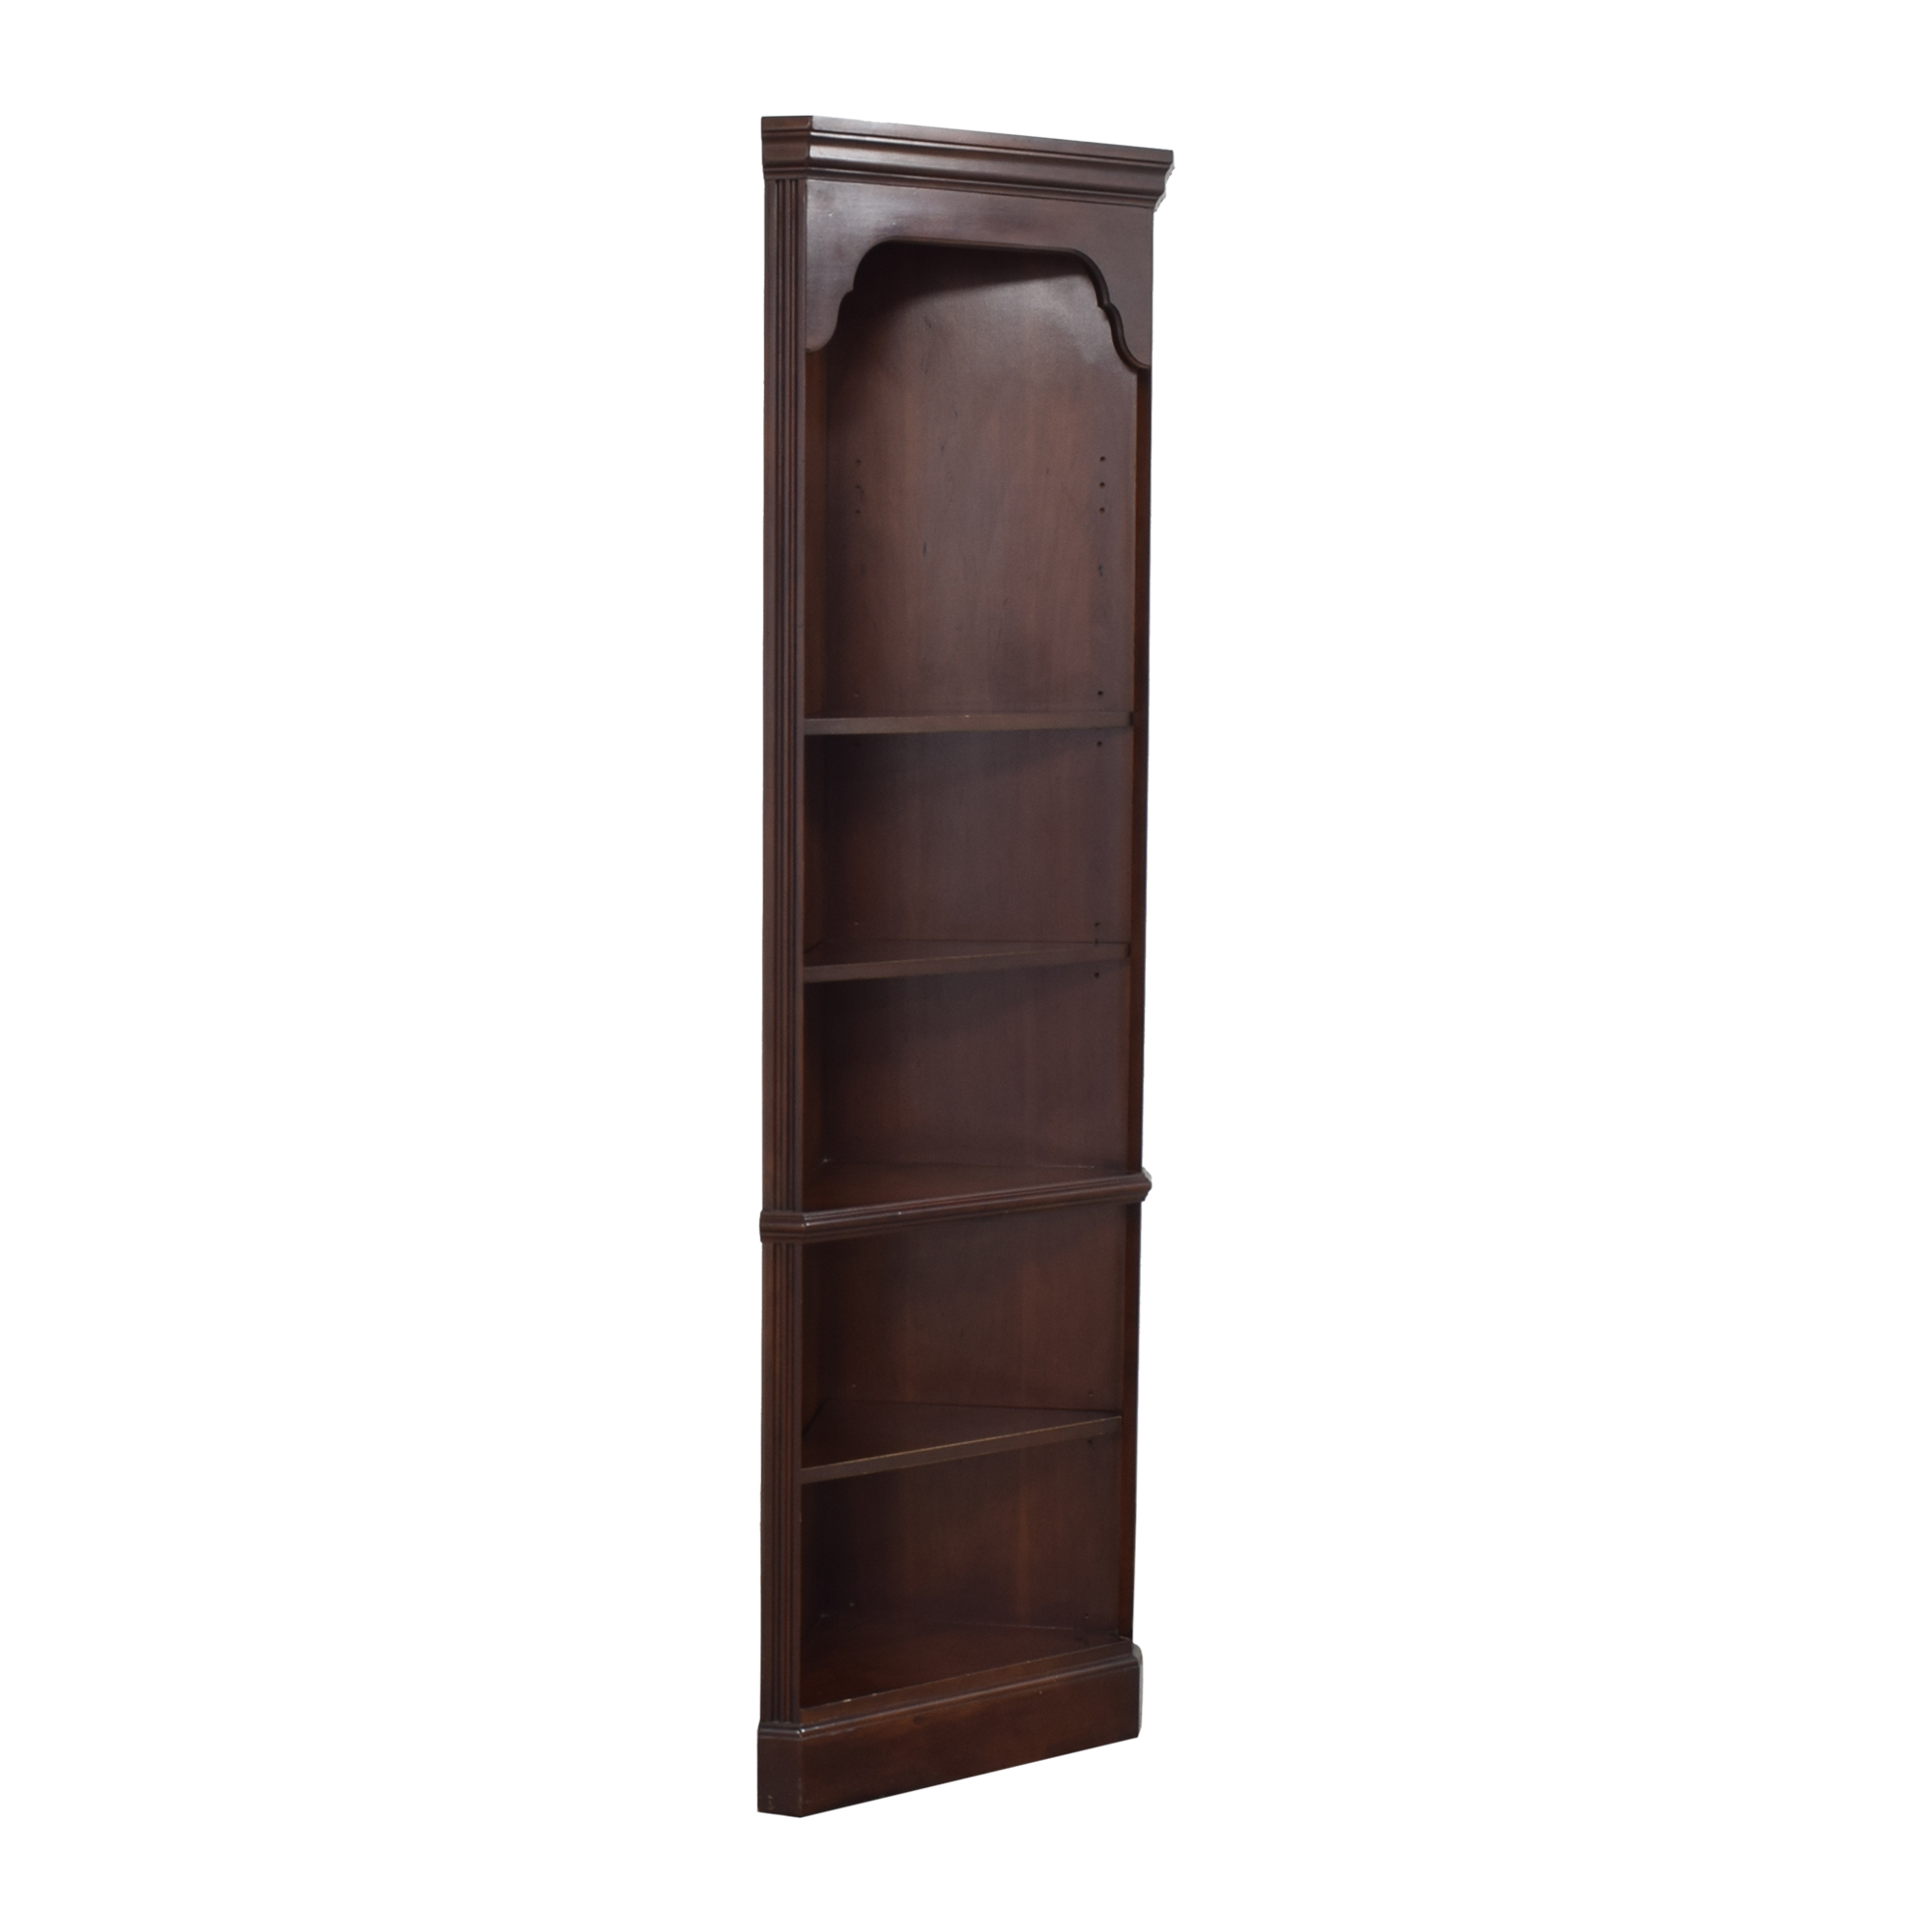 Drexel Heritage Corner Bookcase / Bookcases & Shelving